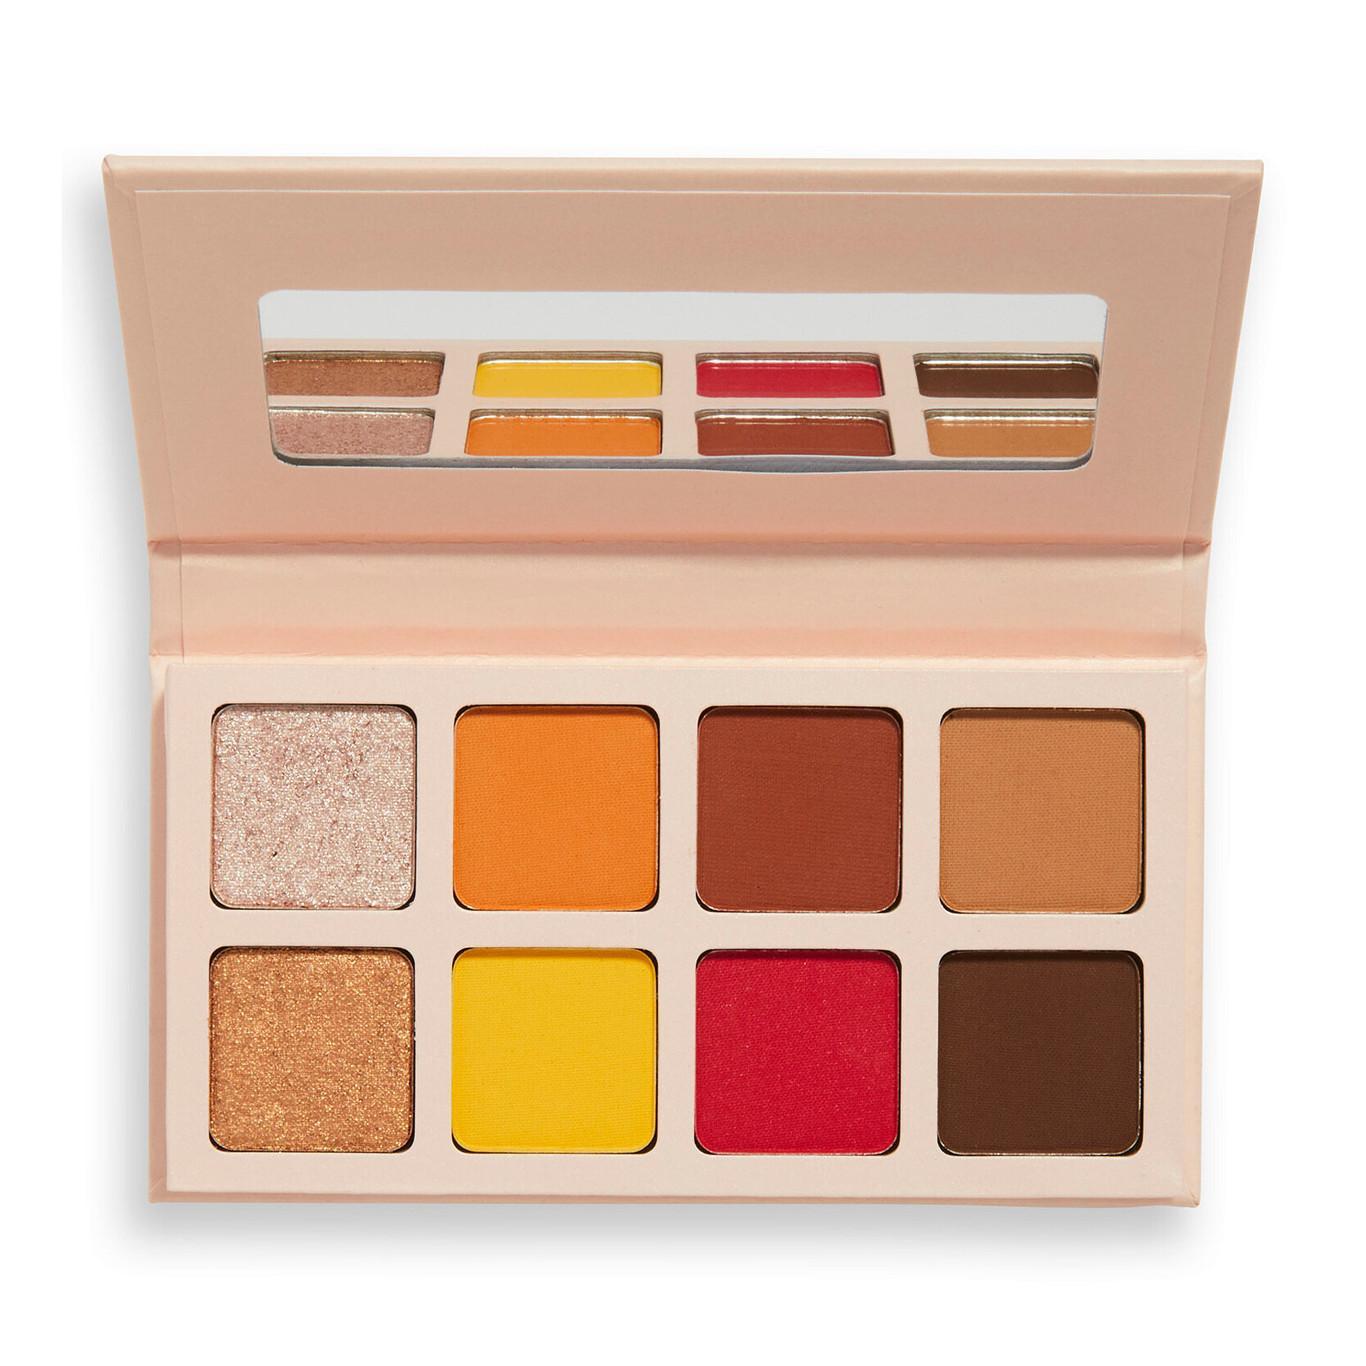 Revolution x Soph Collection Round 3 Mini Spice Eyeshadow Palette Open